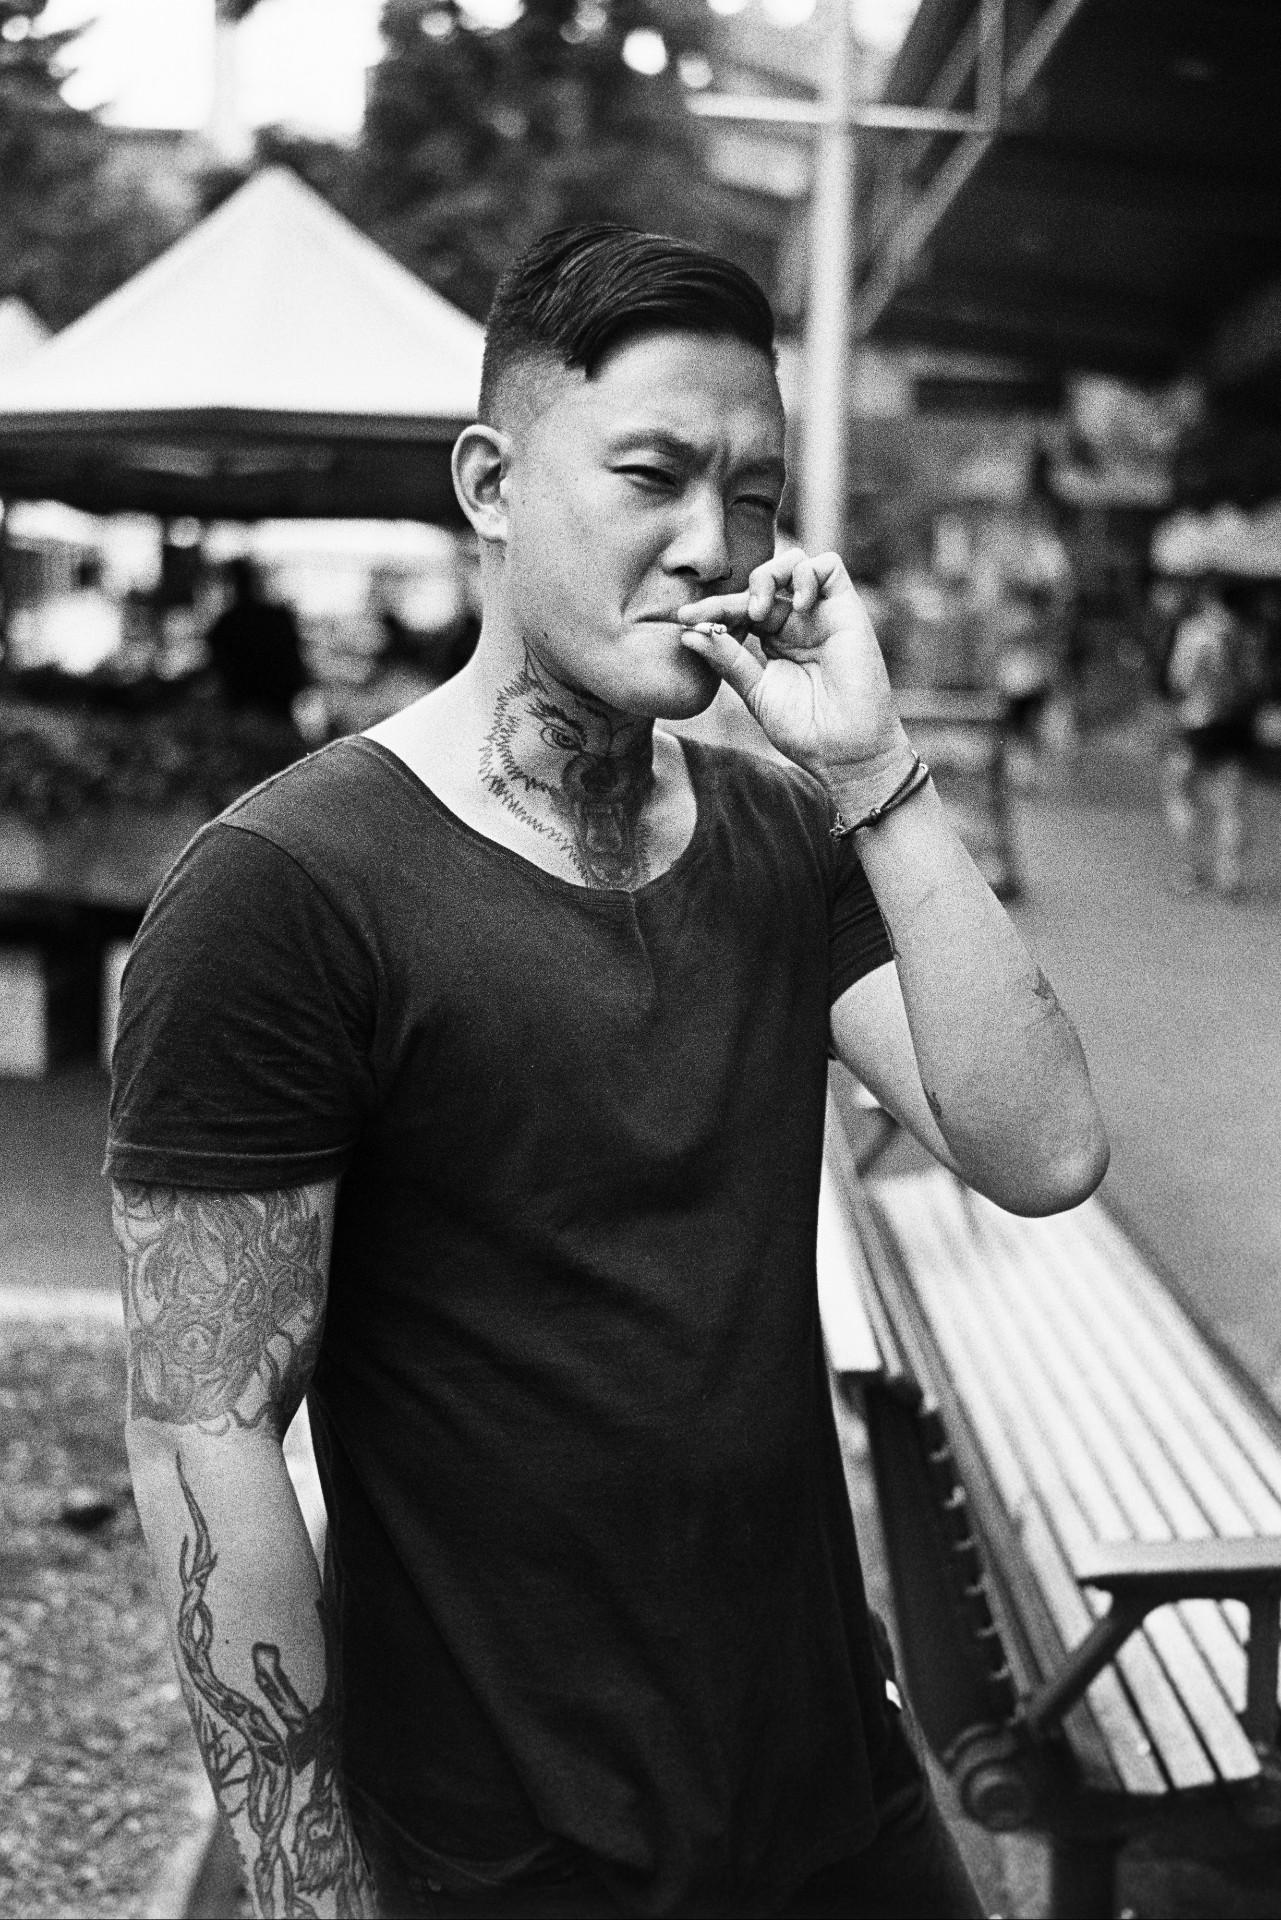 20180415 - Roll 173 - 017-Nick-Bedford,-Photographer-Black and White, Brisbane City, Film, Kodak TRI-X 400, Leica M7, Street Photography, Voigtlander 35mm F1.7 Ultron Asph_01.jpg